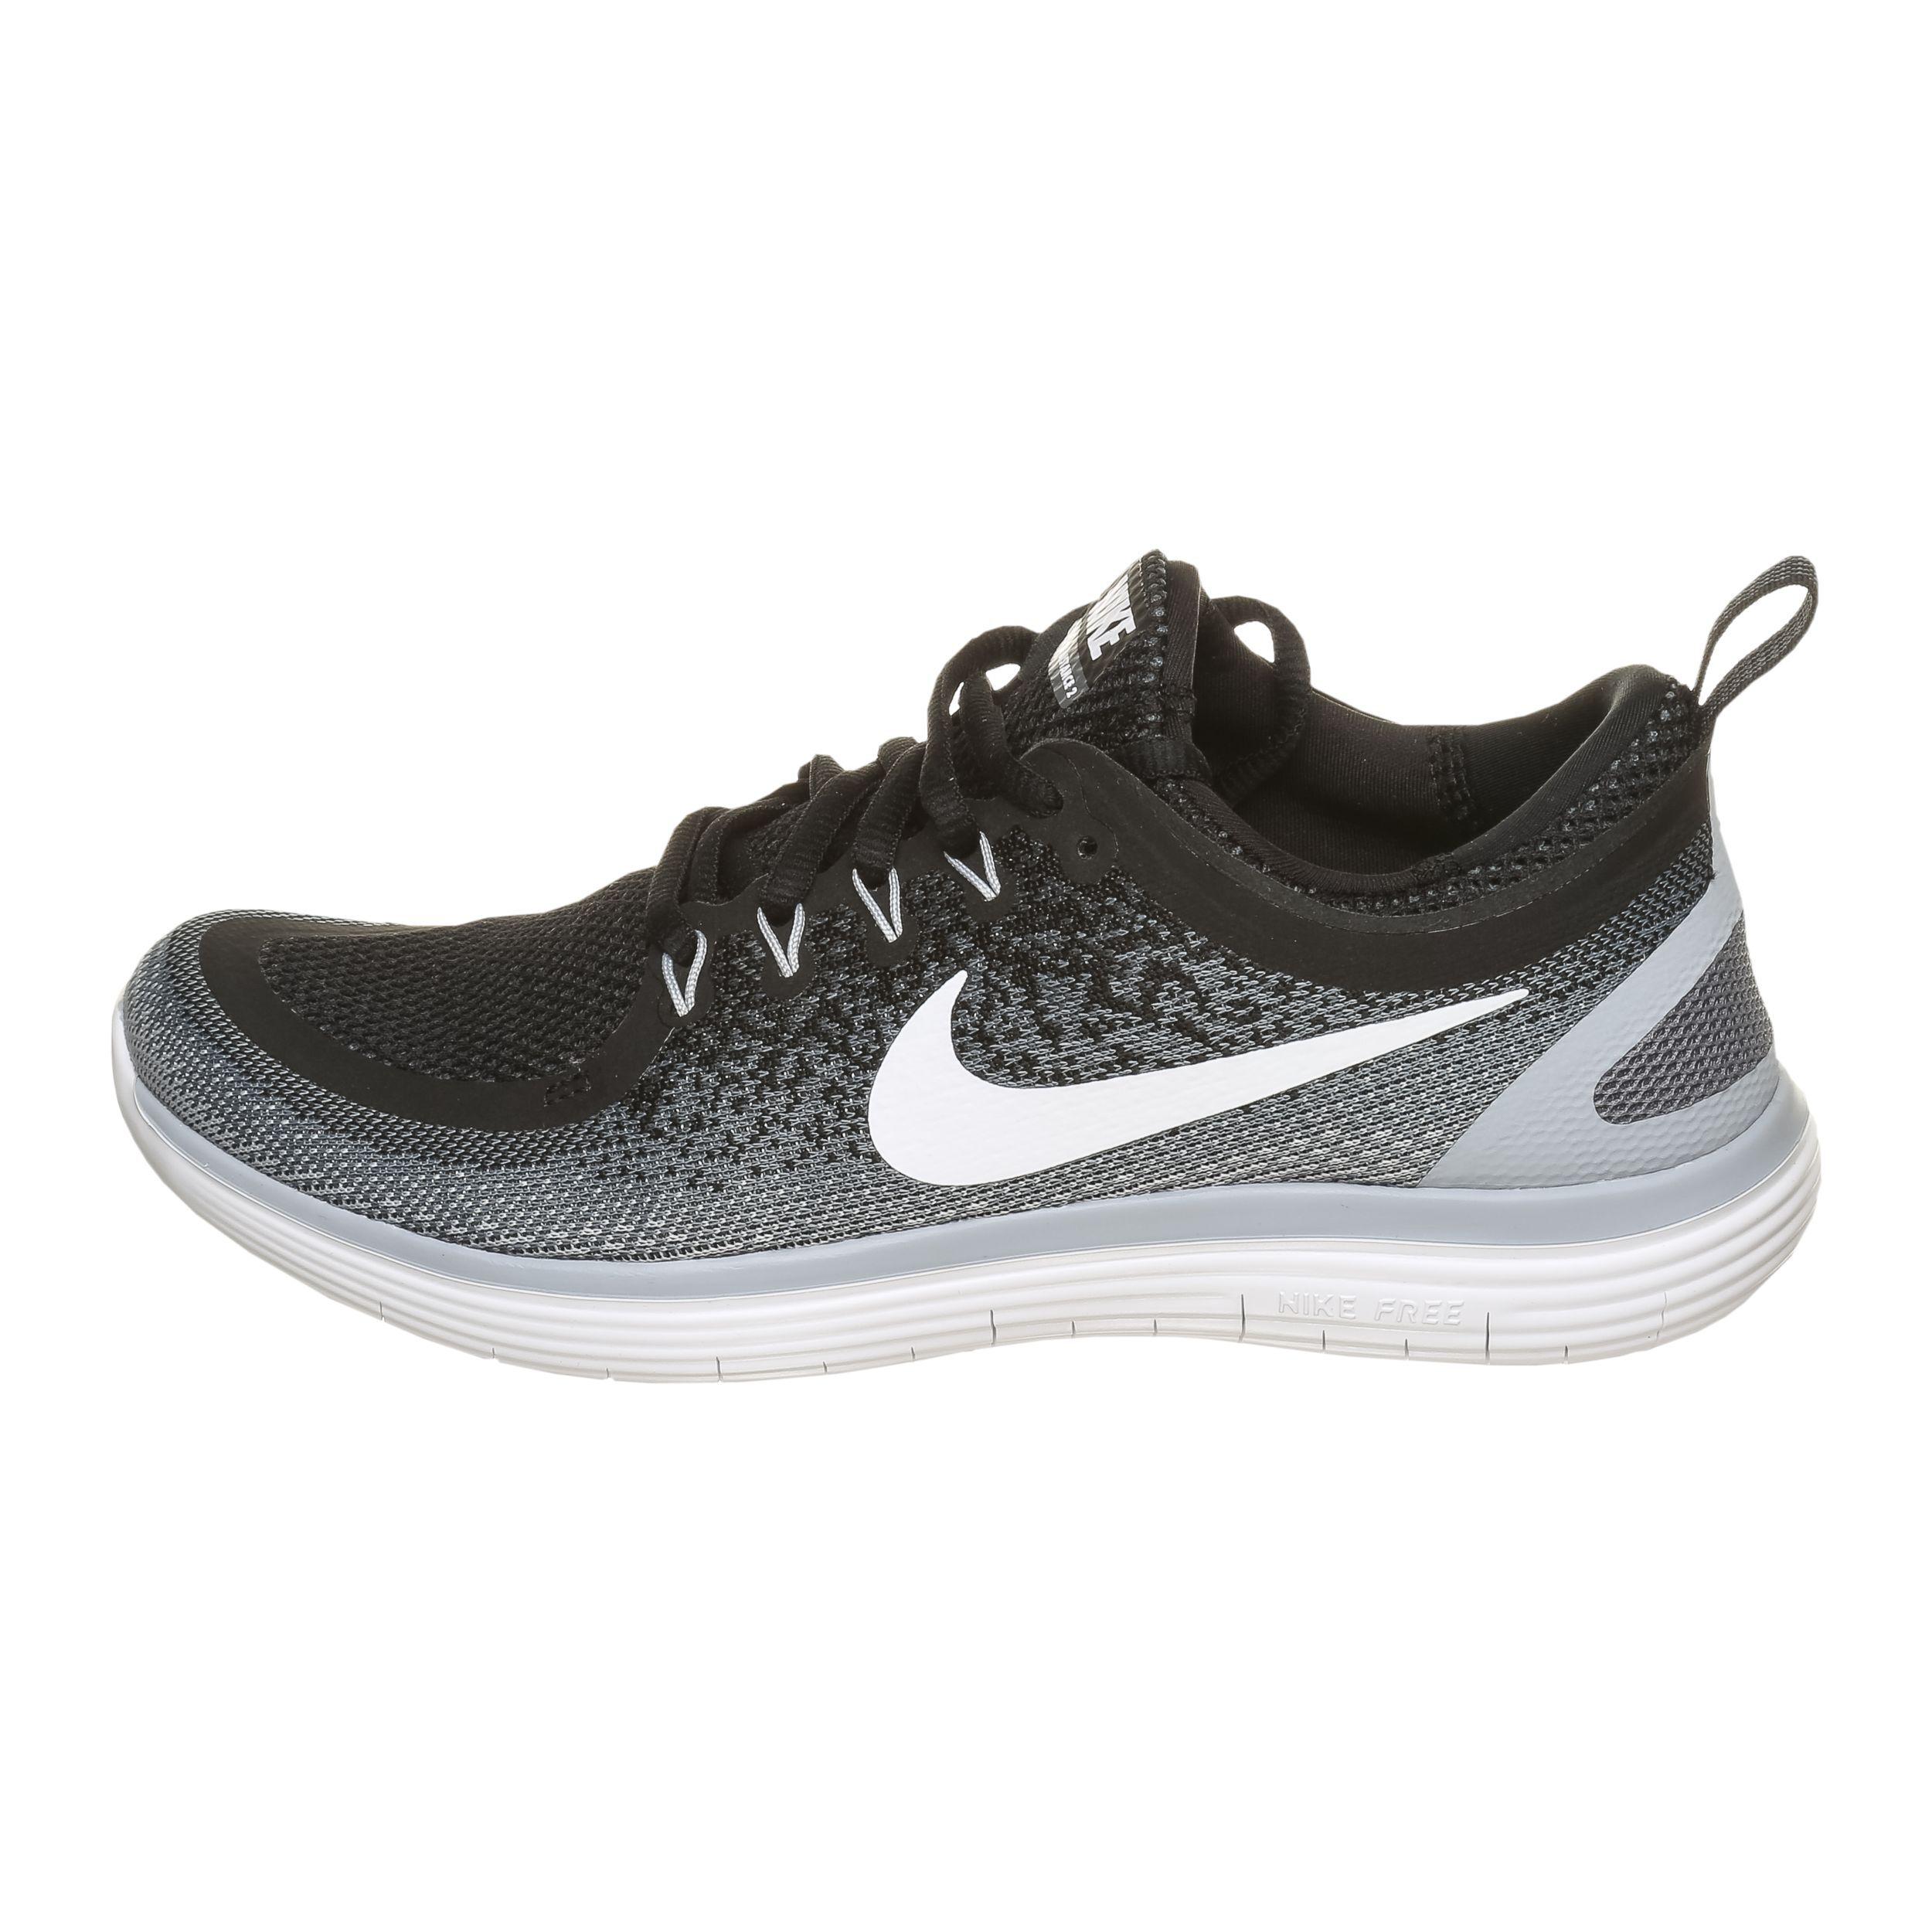 sports shoes 4d6ff 9b46c ... greece nike free rn distance 2 women eaba4 33f4d